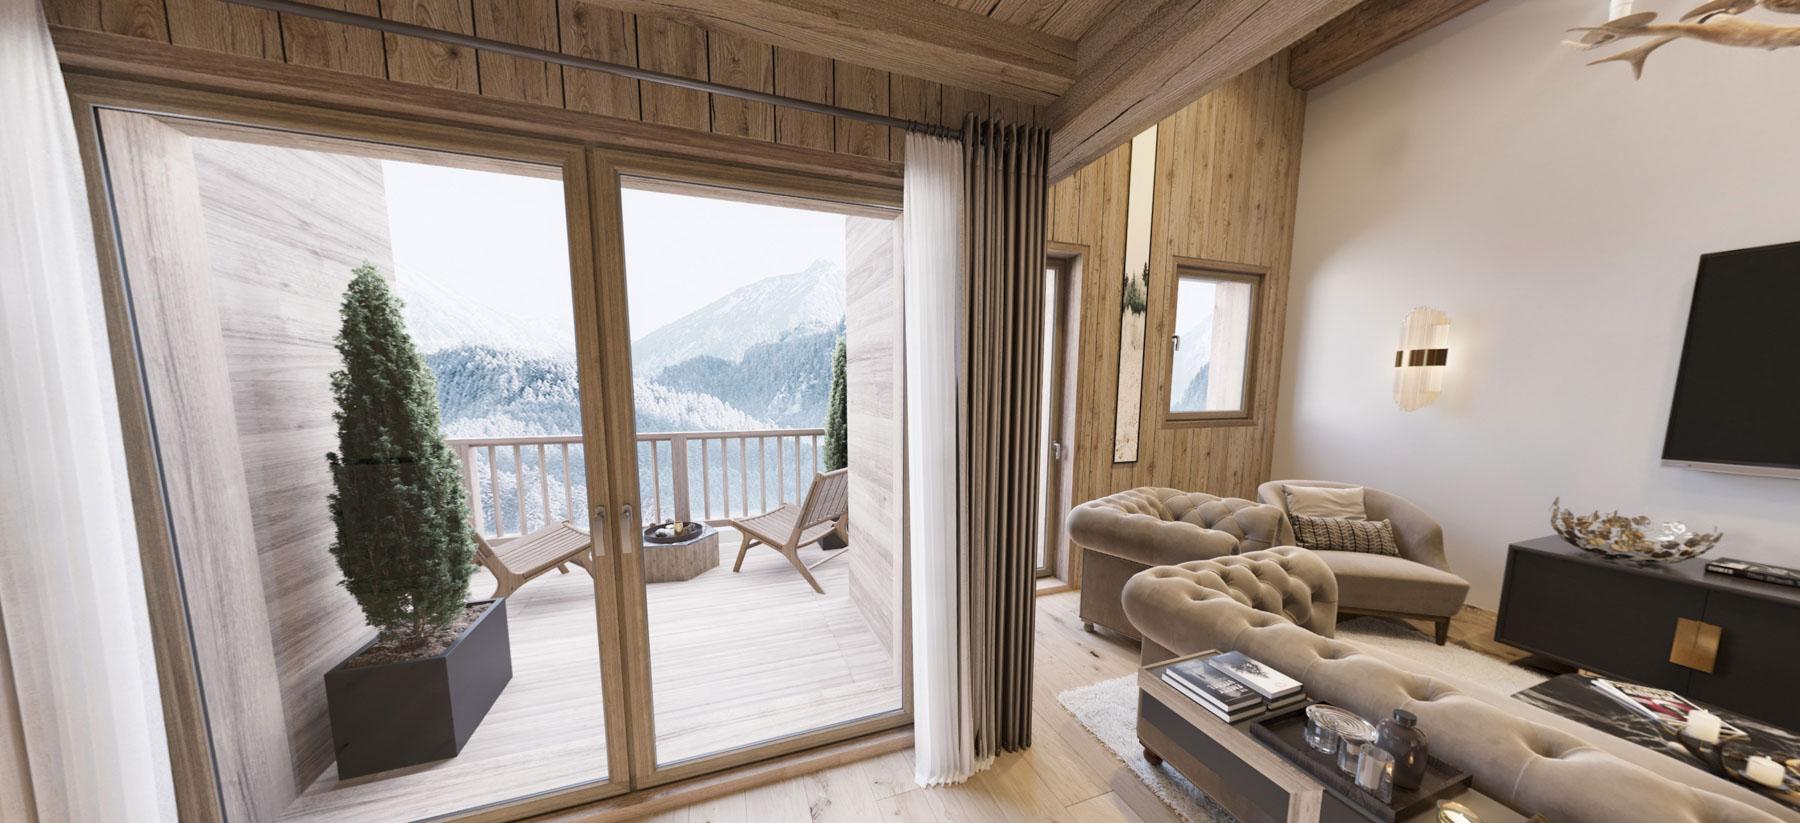 Gite Blanc Example Lounge